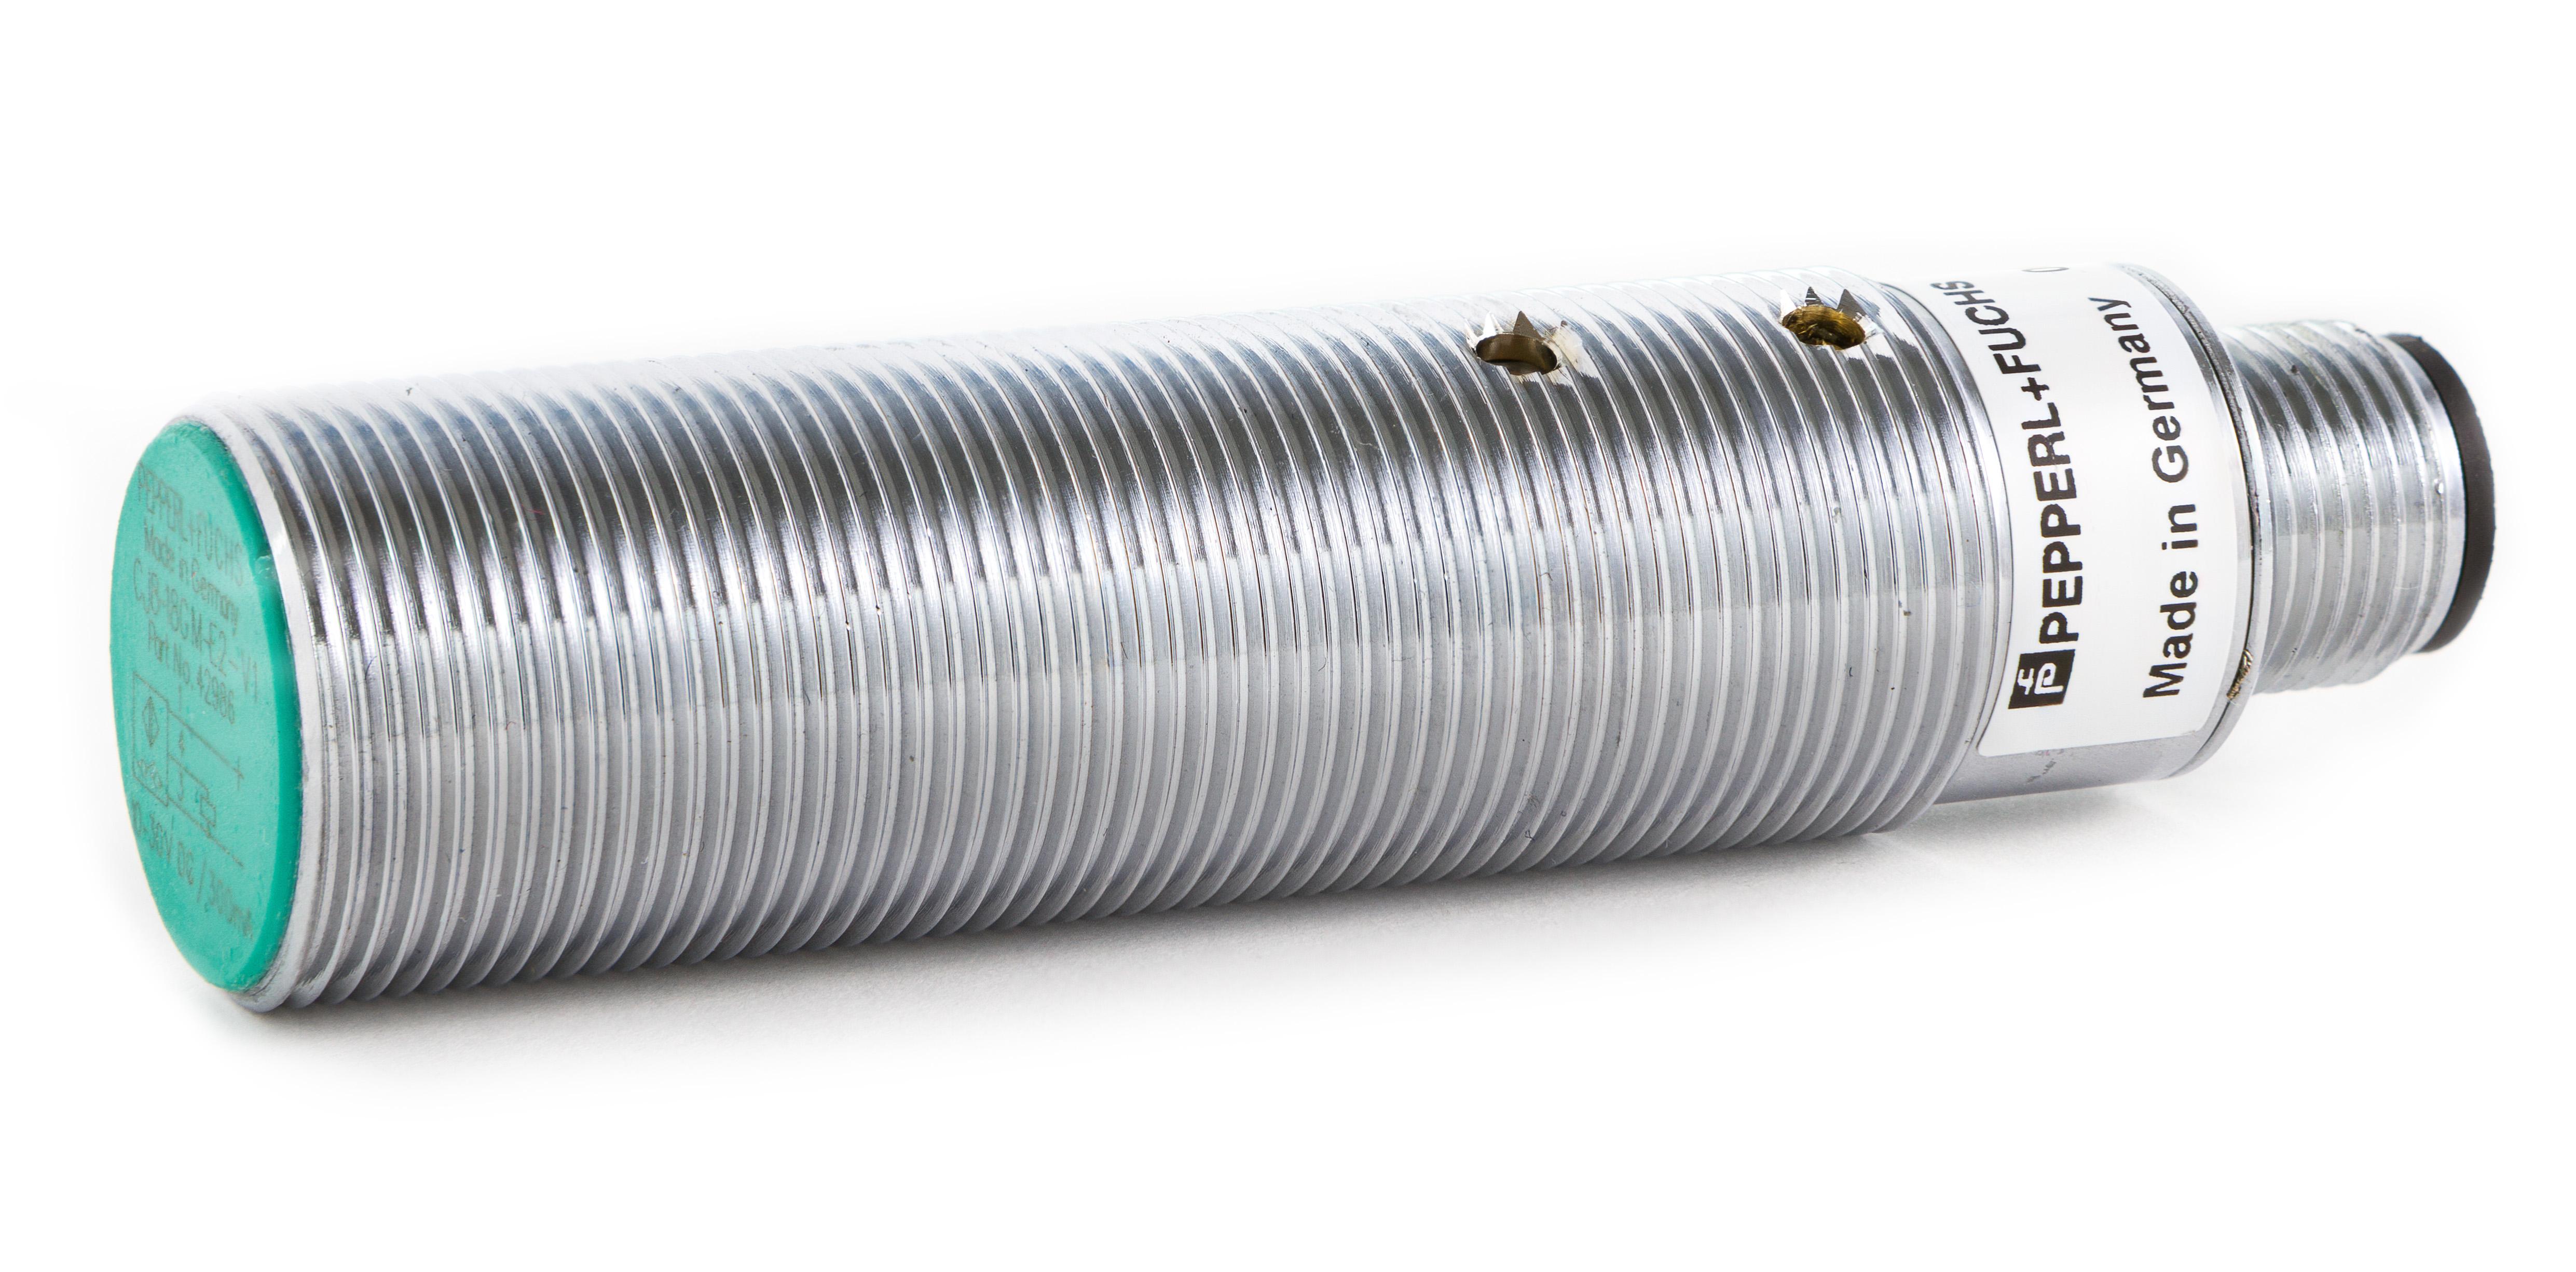 Capacitive displacement sensor - Wikipedia